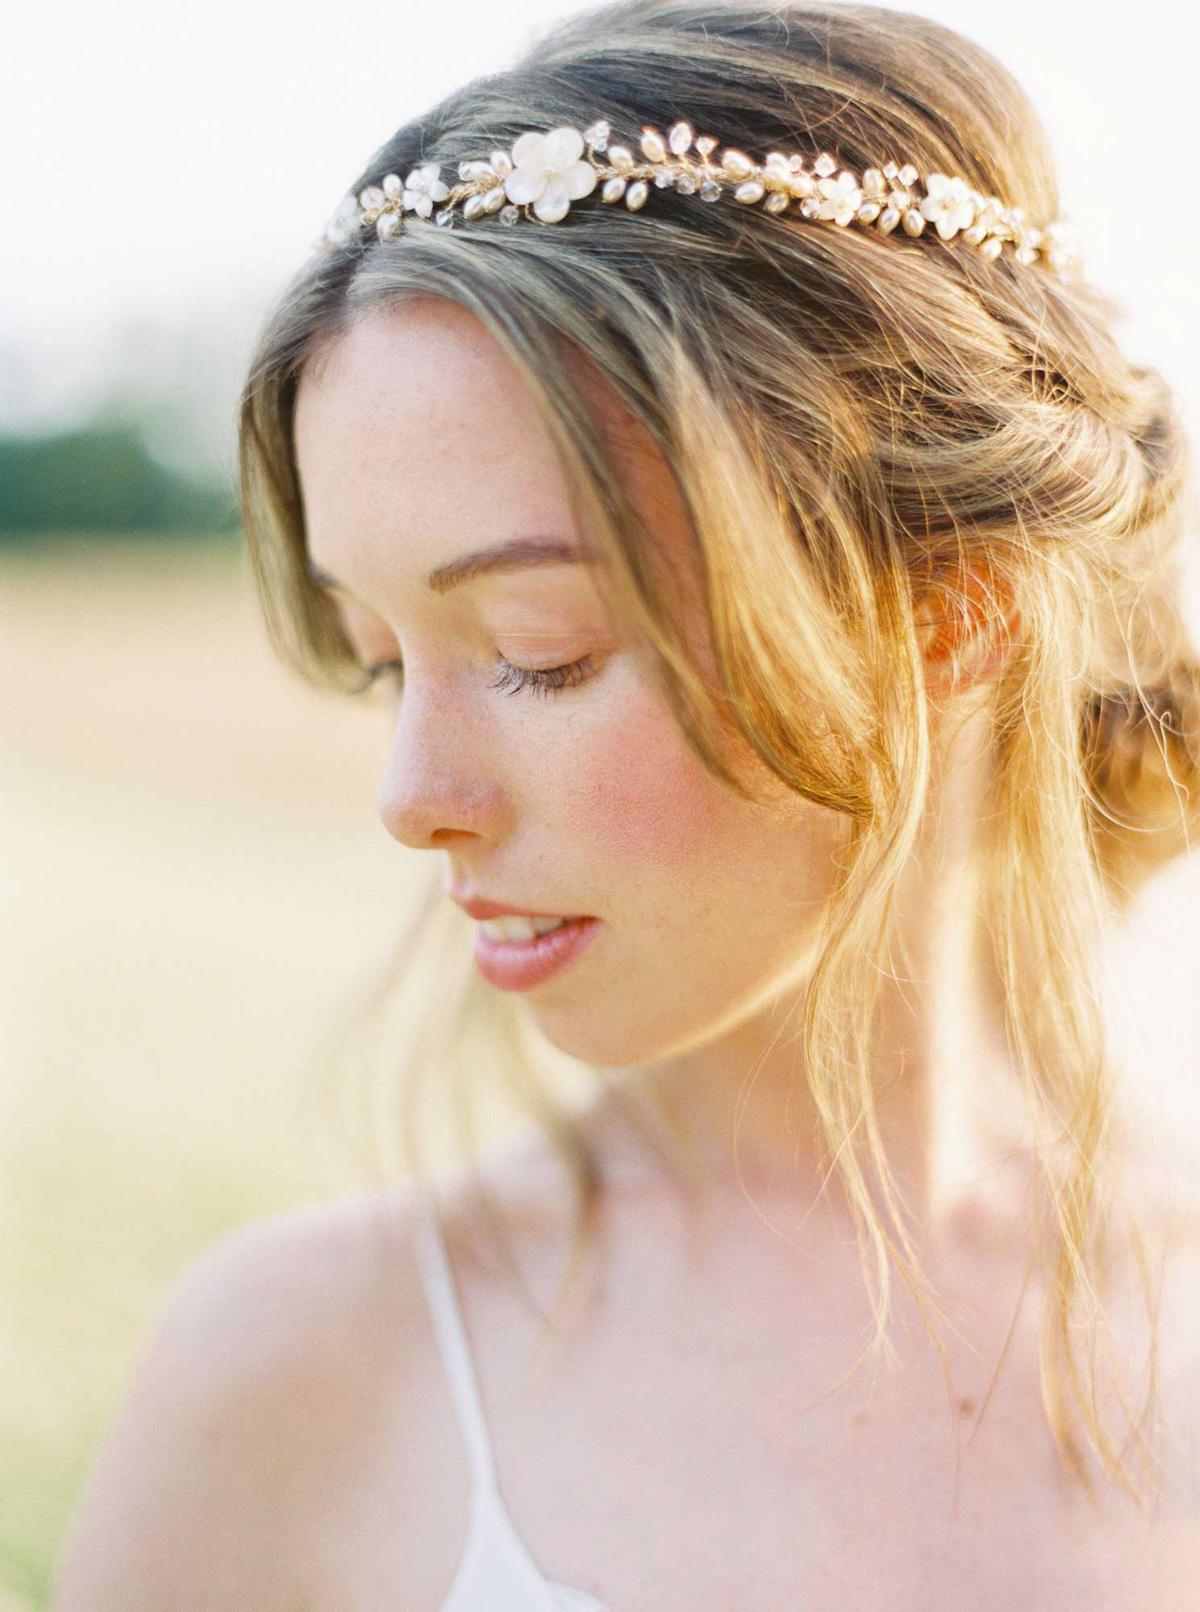 kayla-yestal-vineyard-bride-swish-list-woodland-weddings-niagara-wedding-editorial-46.jpg